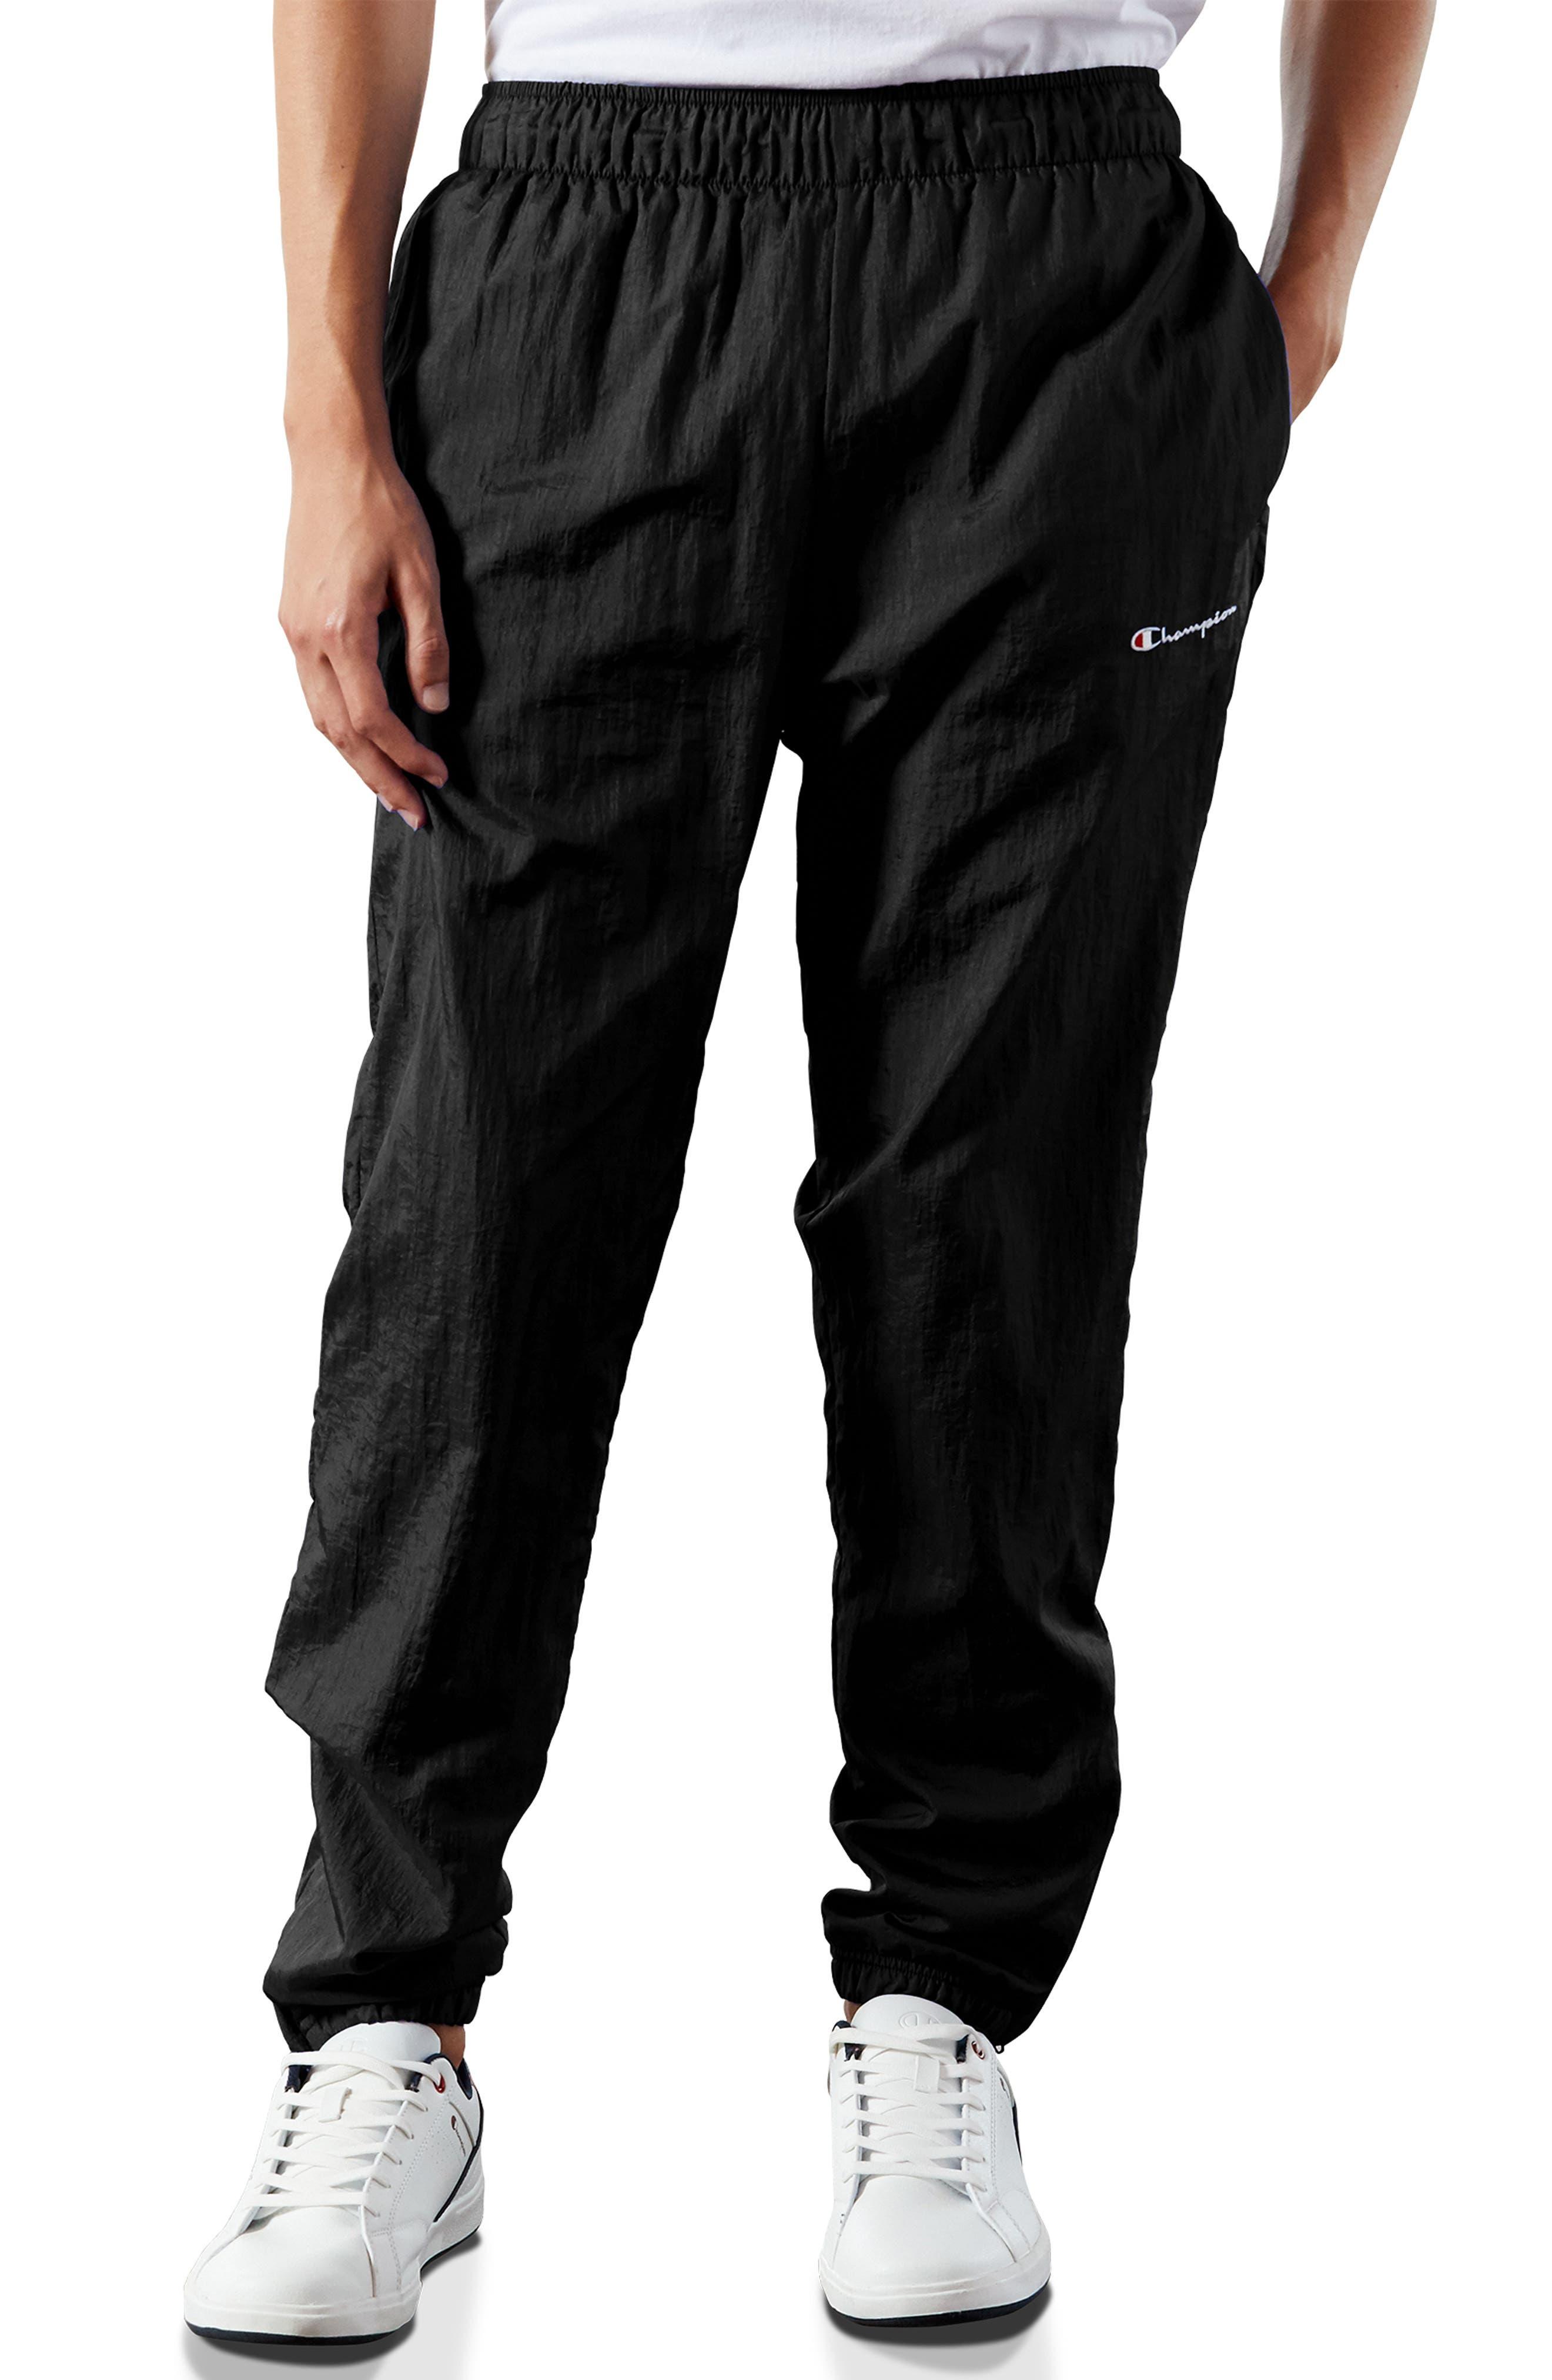 Nylon Warm-Up Pants, Main, color, BLACK/ SILVER/ WHITE